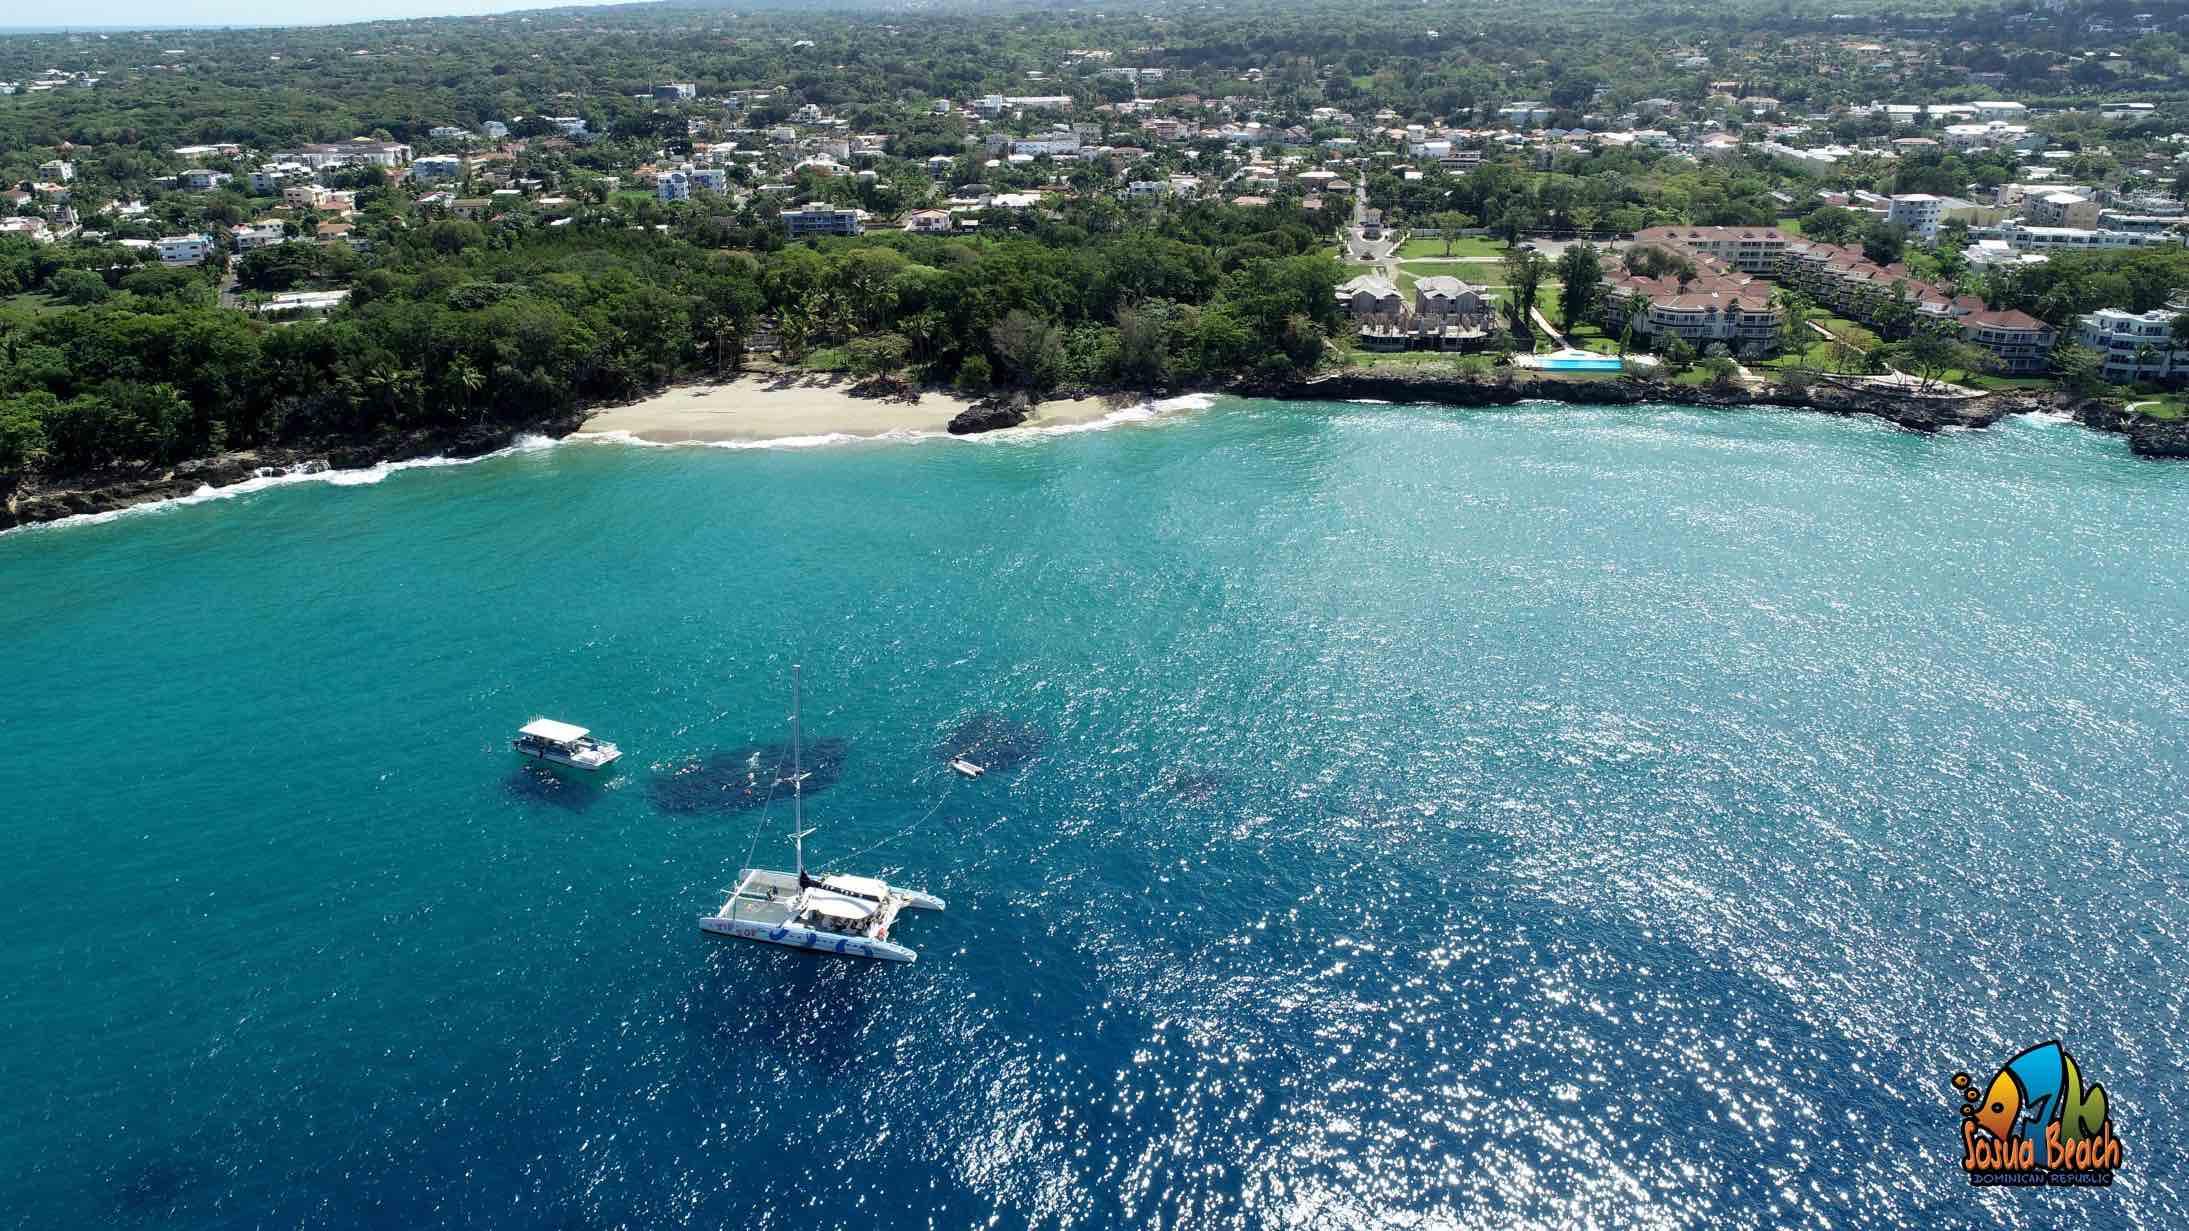 Ocean View Condo For Sale Sosua Dominican Republic